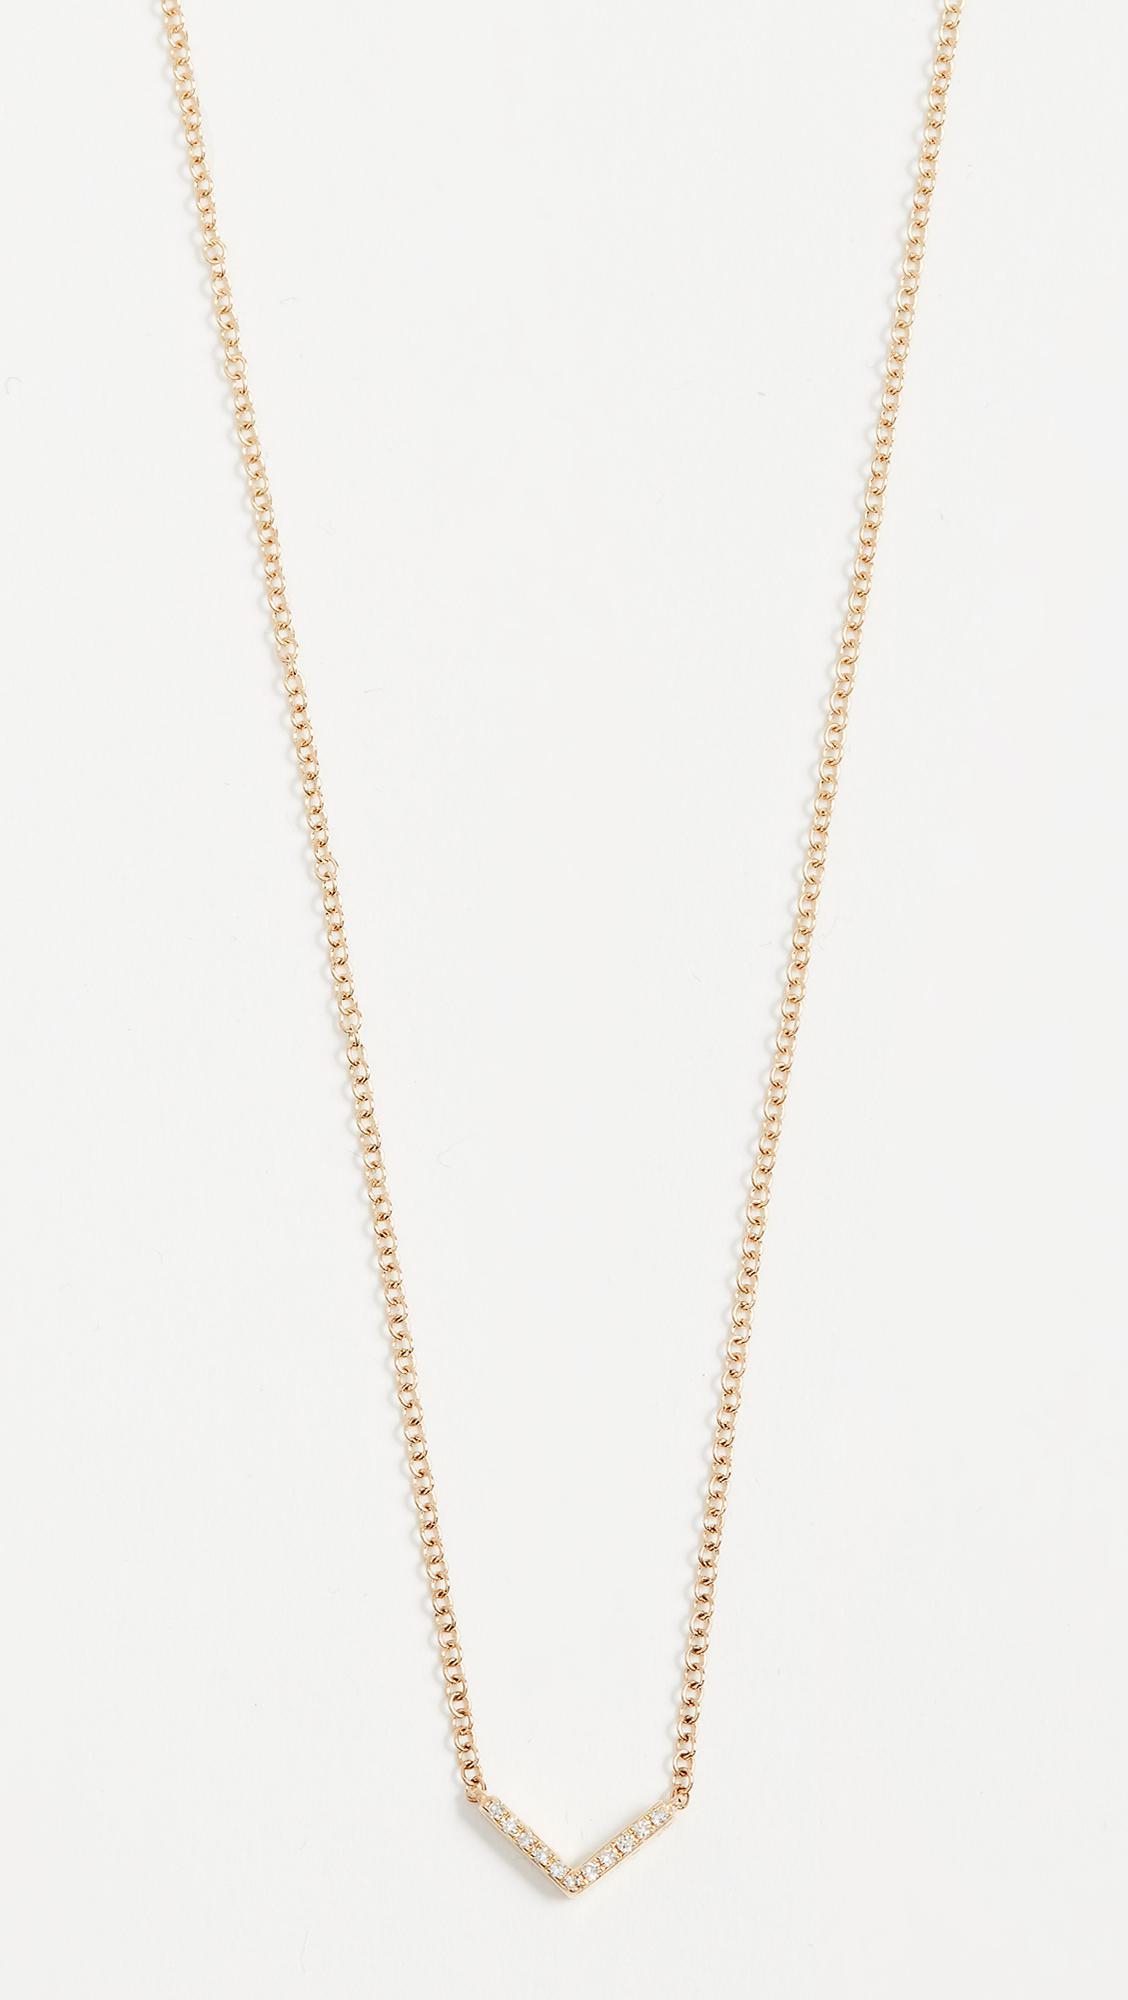 EF Collection 14k Mini Star Diamond Necklace hPvy1PinM1